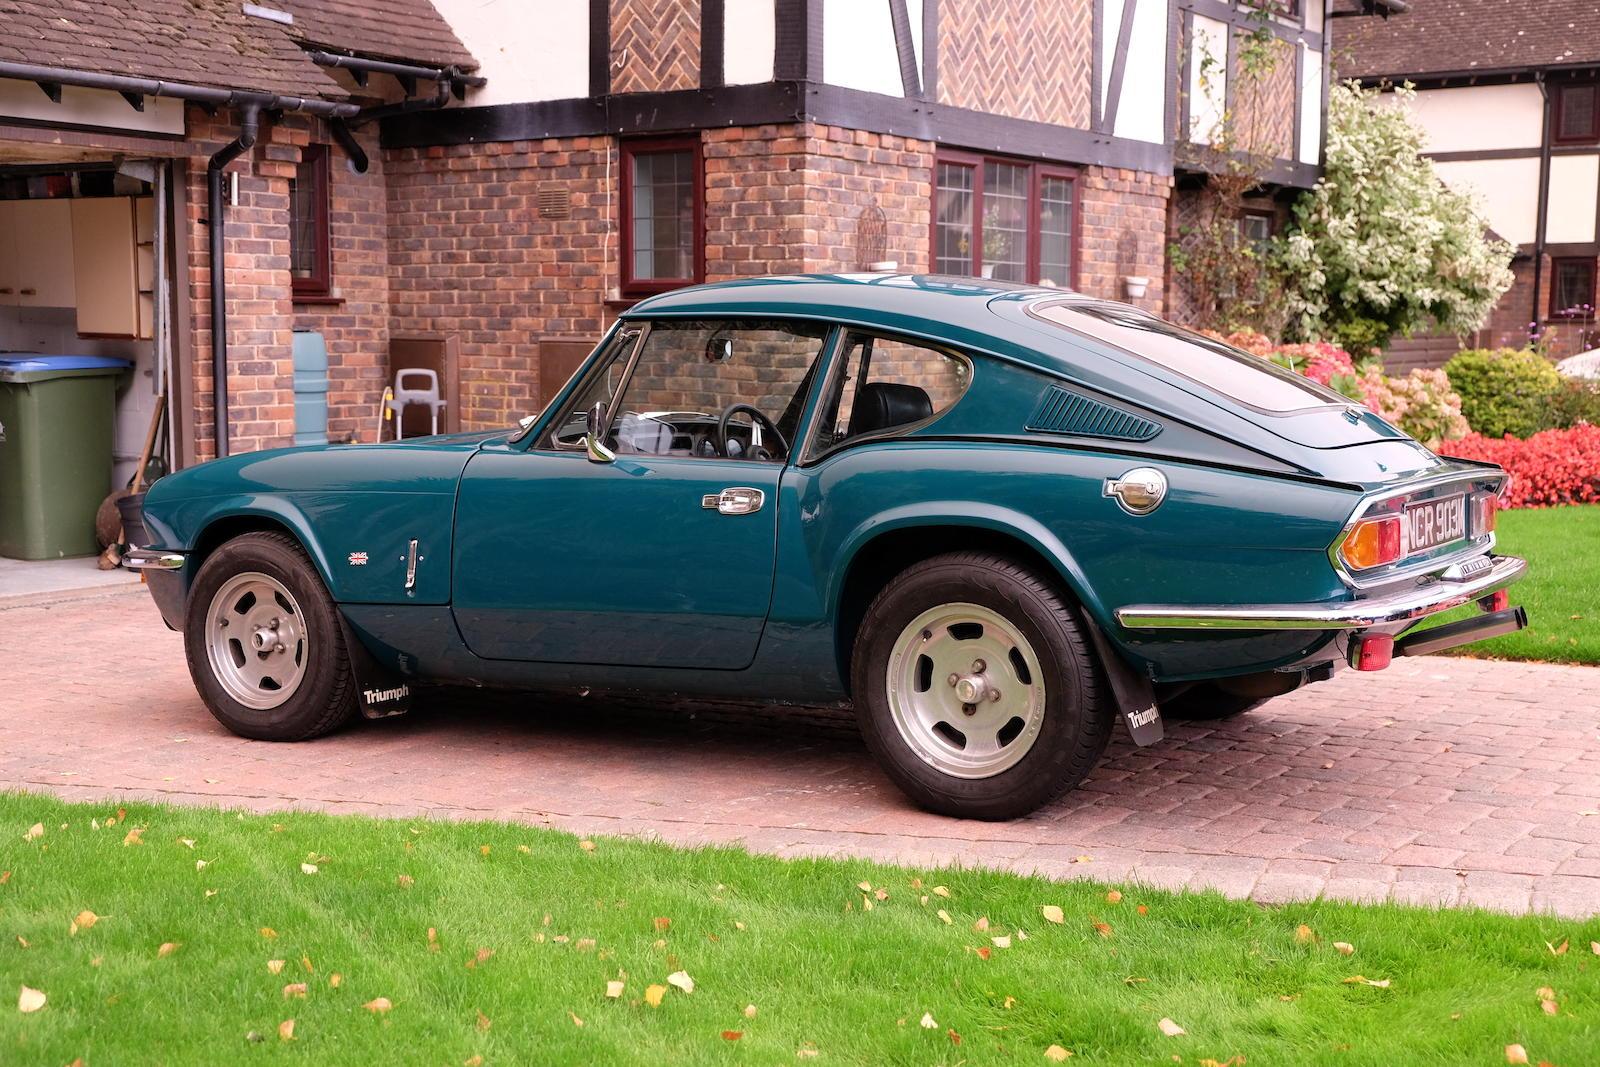 1972 Triumph GT6 Mk III Coupé rear 3/4